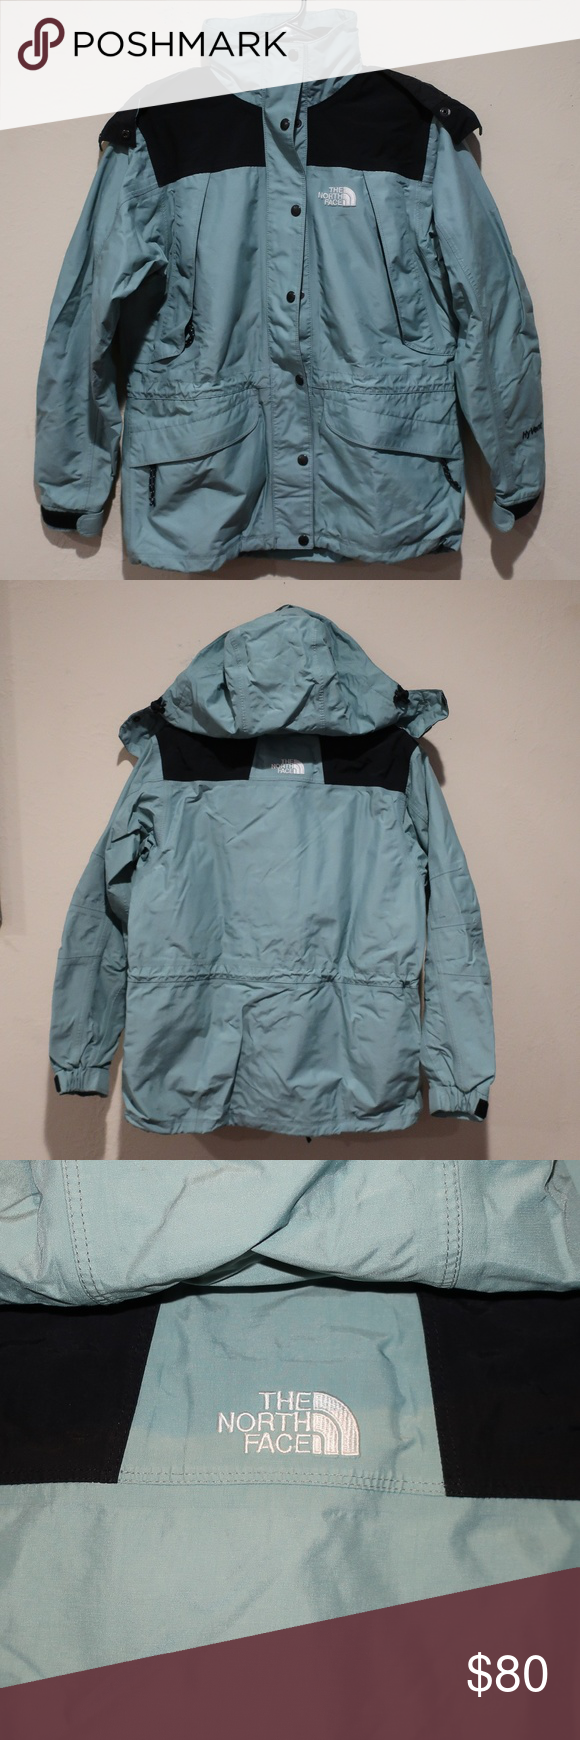 Vintage 06 The North Face Hyvent Jacket Wmns Sz S North Face Hyvent Jacket North Face Hyvent Jackets [ 1740 x 580 Pixel ]